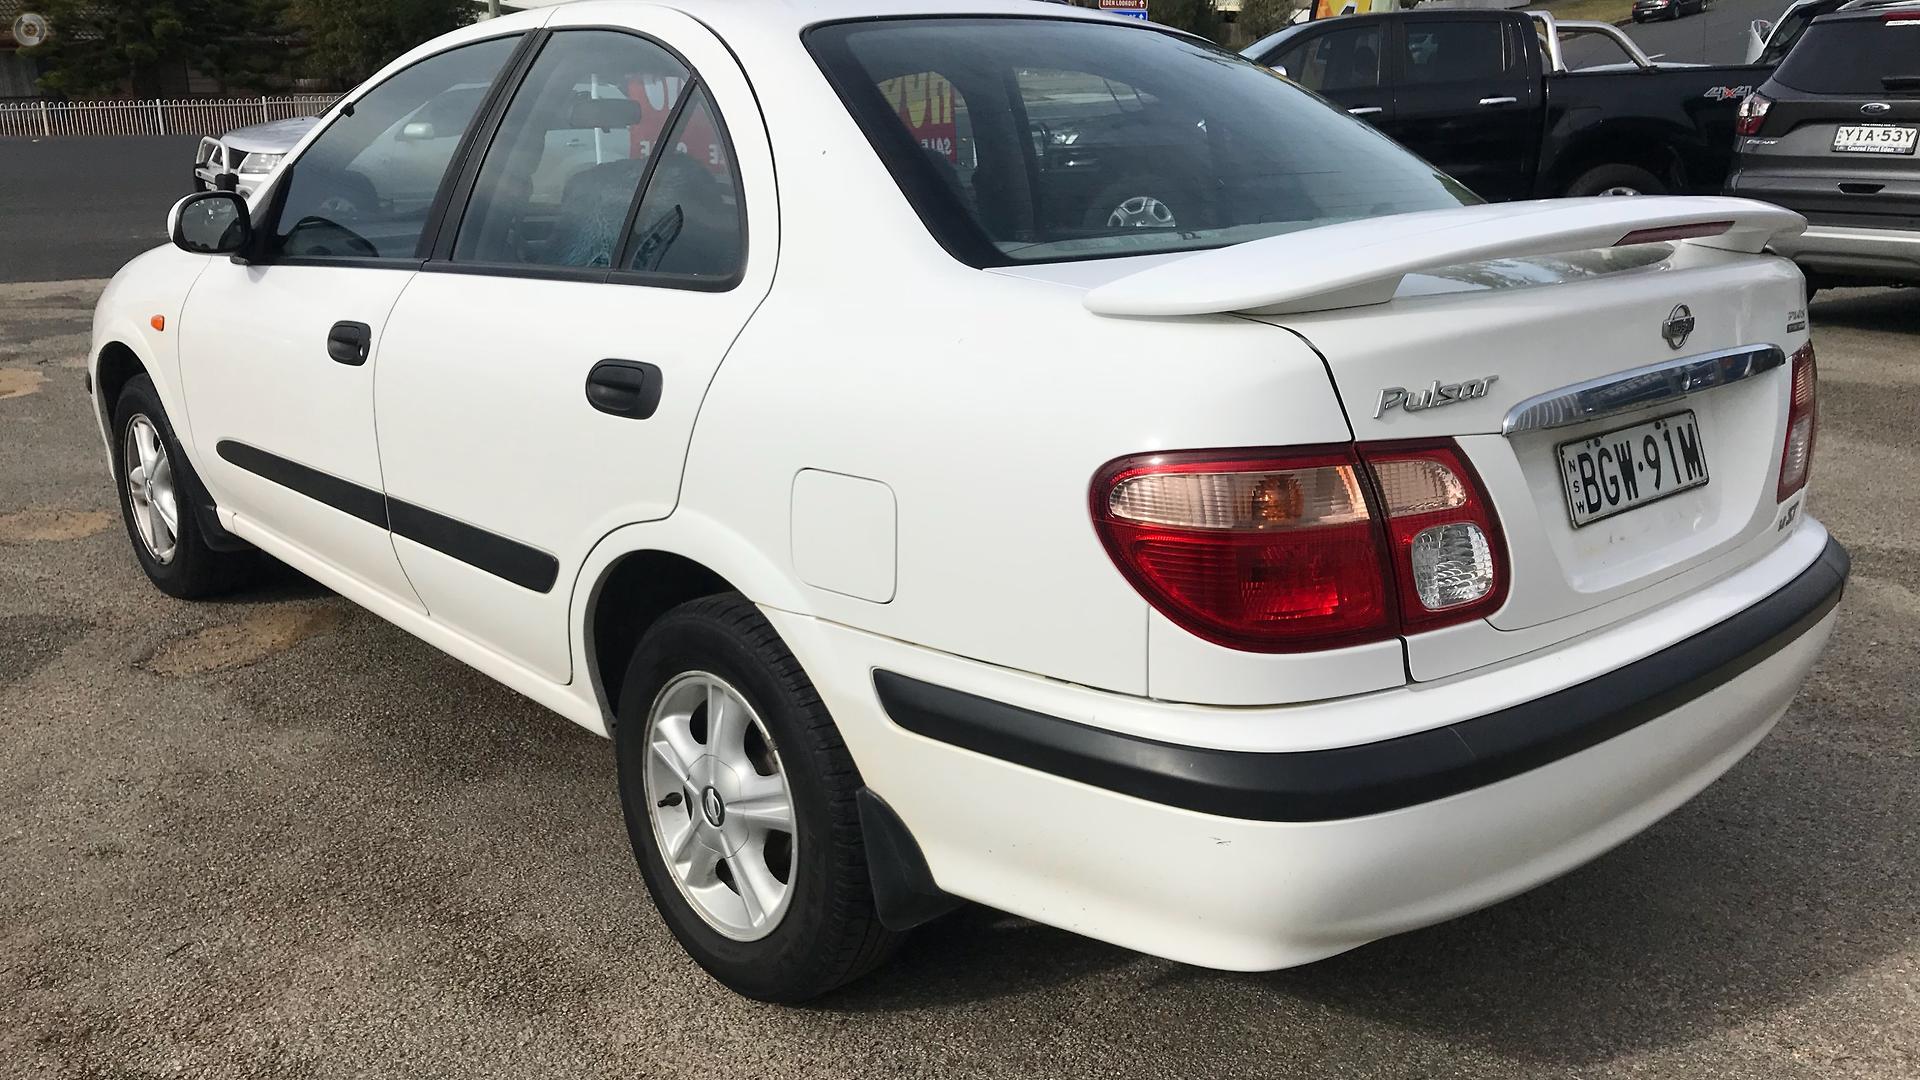 2002 Nissan Pulsar ST Plus N16